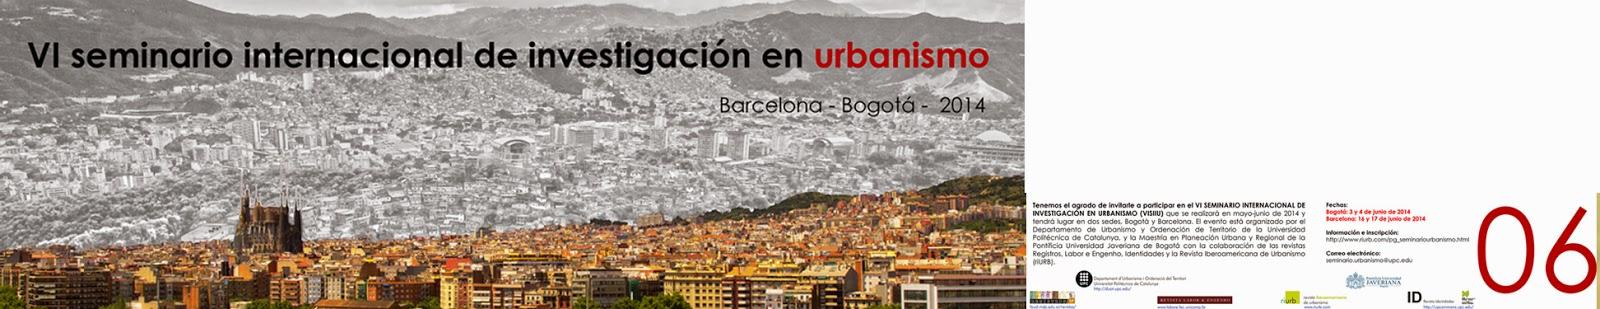 VI Seminario Internacional en Urbanismo Etsab junio 2014